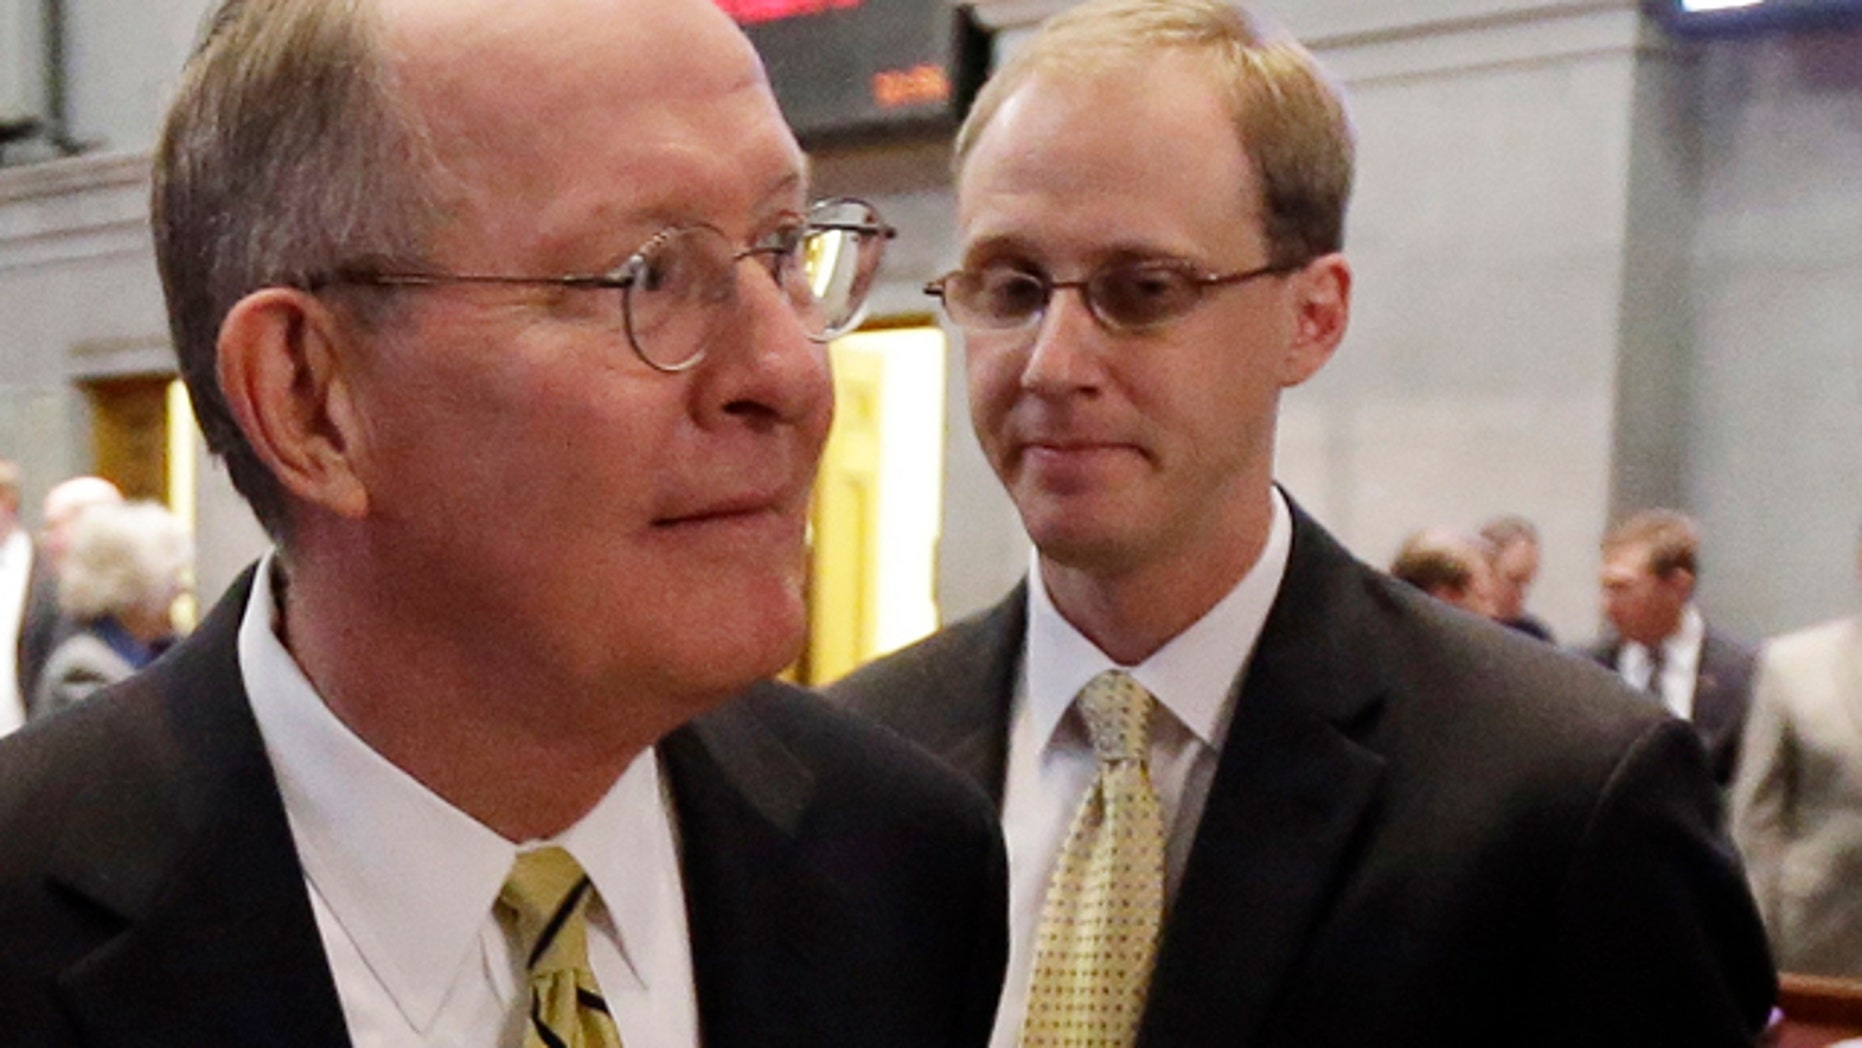 Jan. 9, 2013: Sen. Lamar Alexander, R-Tenn., left, leaves the Tennessee House of Representatives chamber with his chief of staff, Ryan Loskarn, right, in Nashville, Tenn.